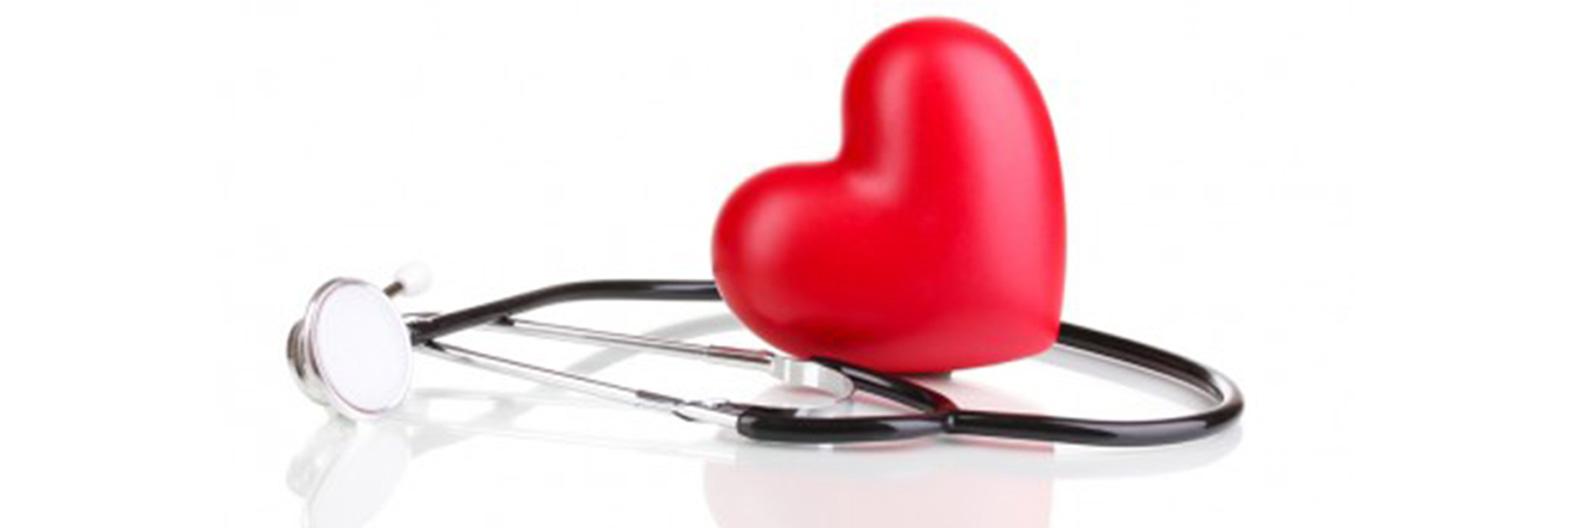 vds hipertenzinis hipertenzijos tipas